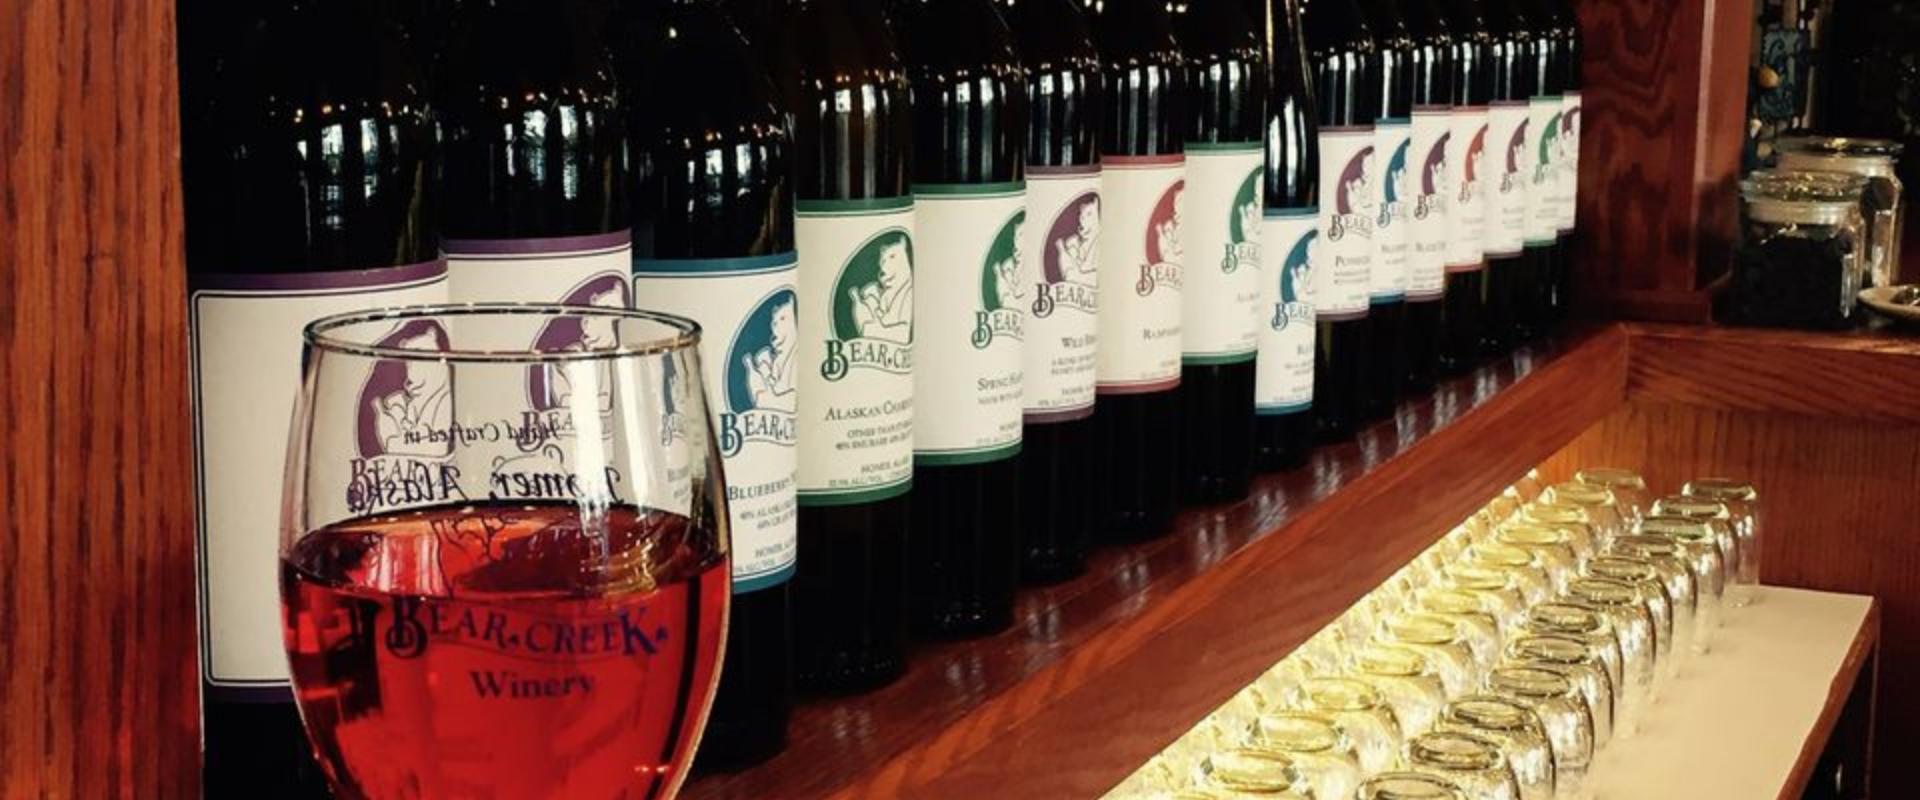 Bear Creek Winery and Lodging